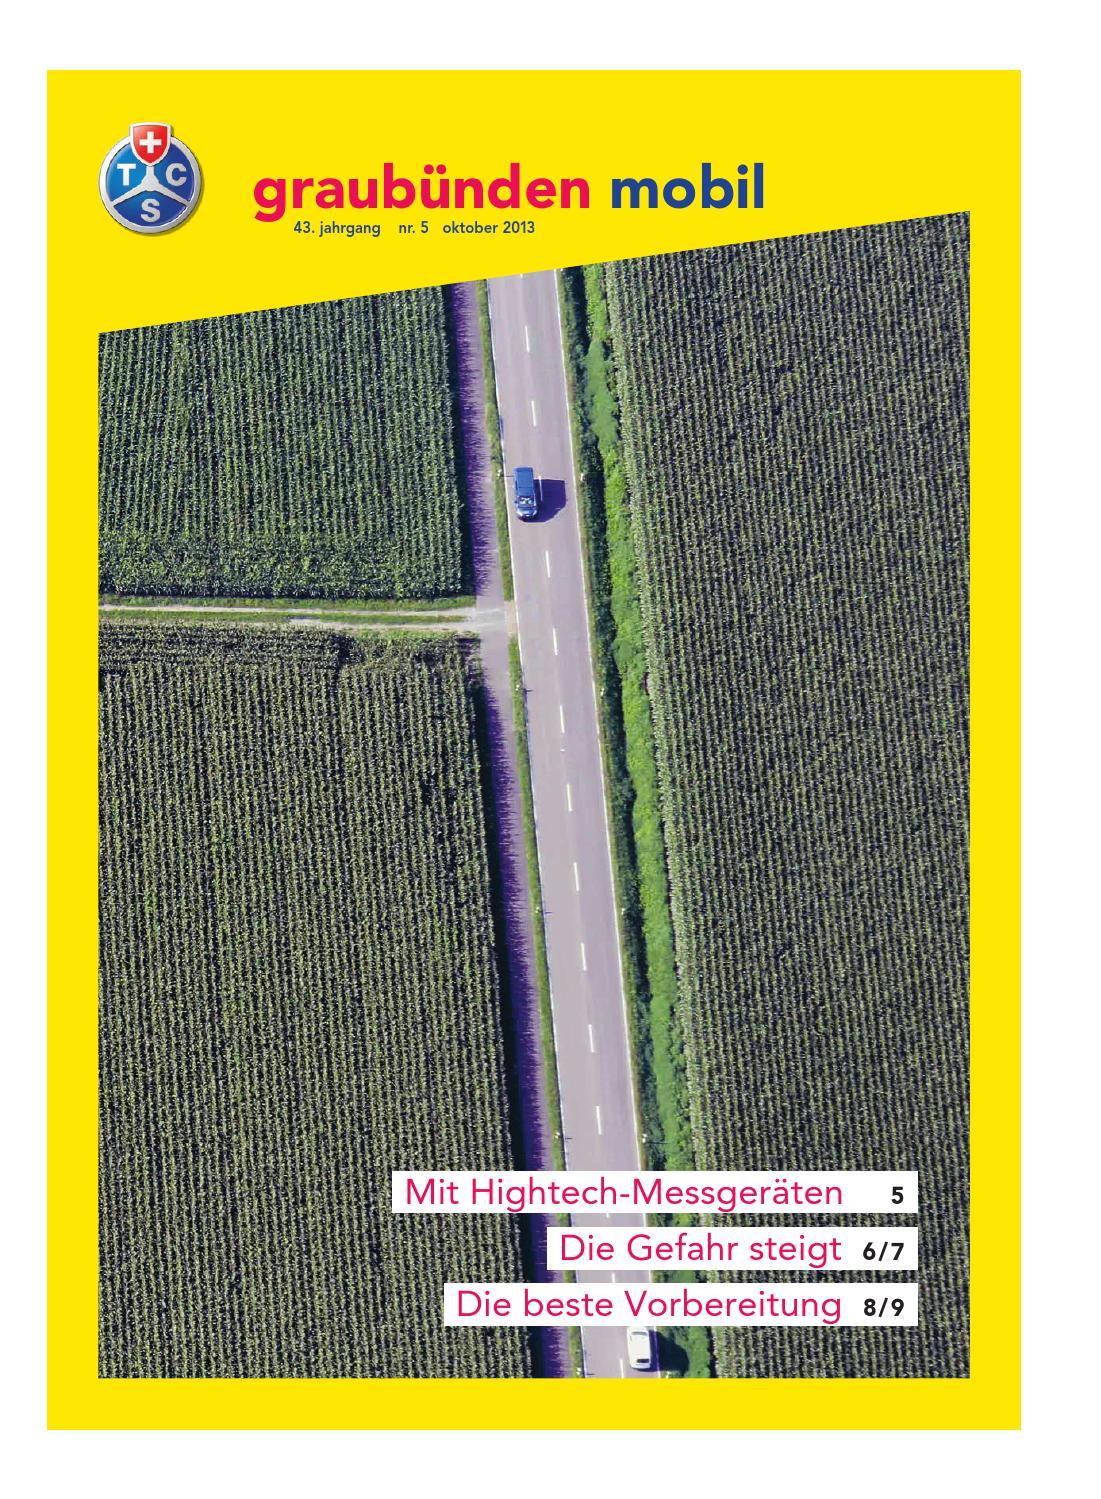 Pflegeheime Kerken-Aldekerk, Seniorenheime, Altenheime